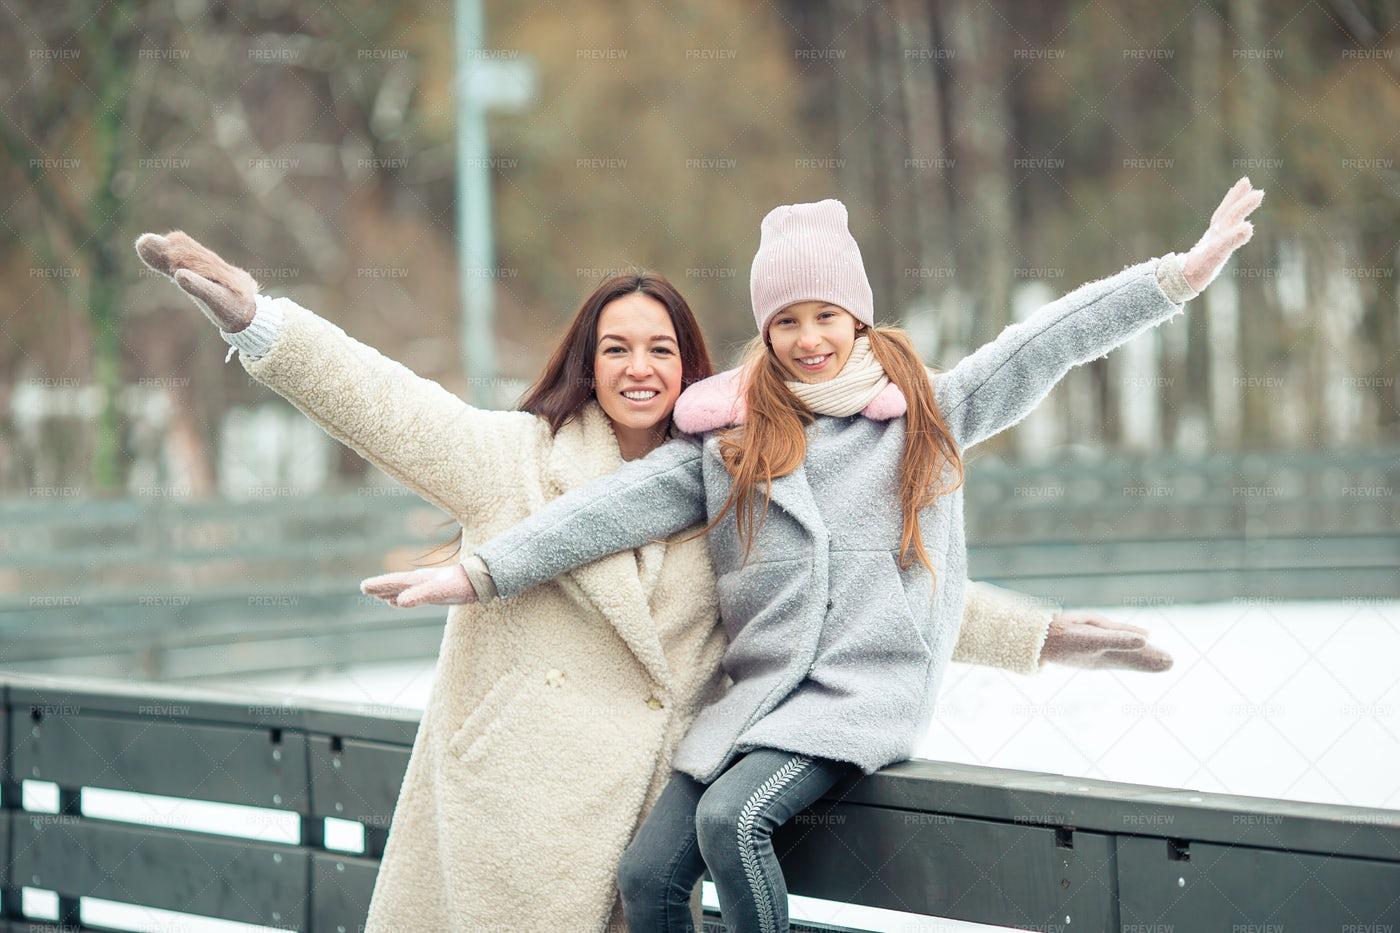 Girl And Mother Having Fun: Stock Photos